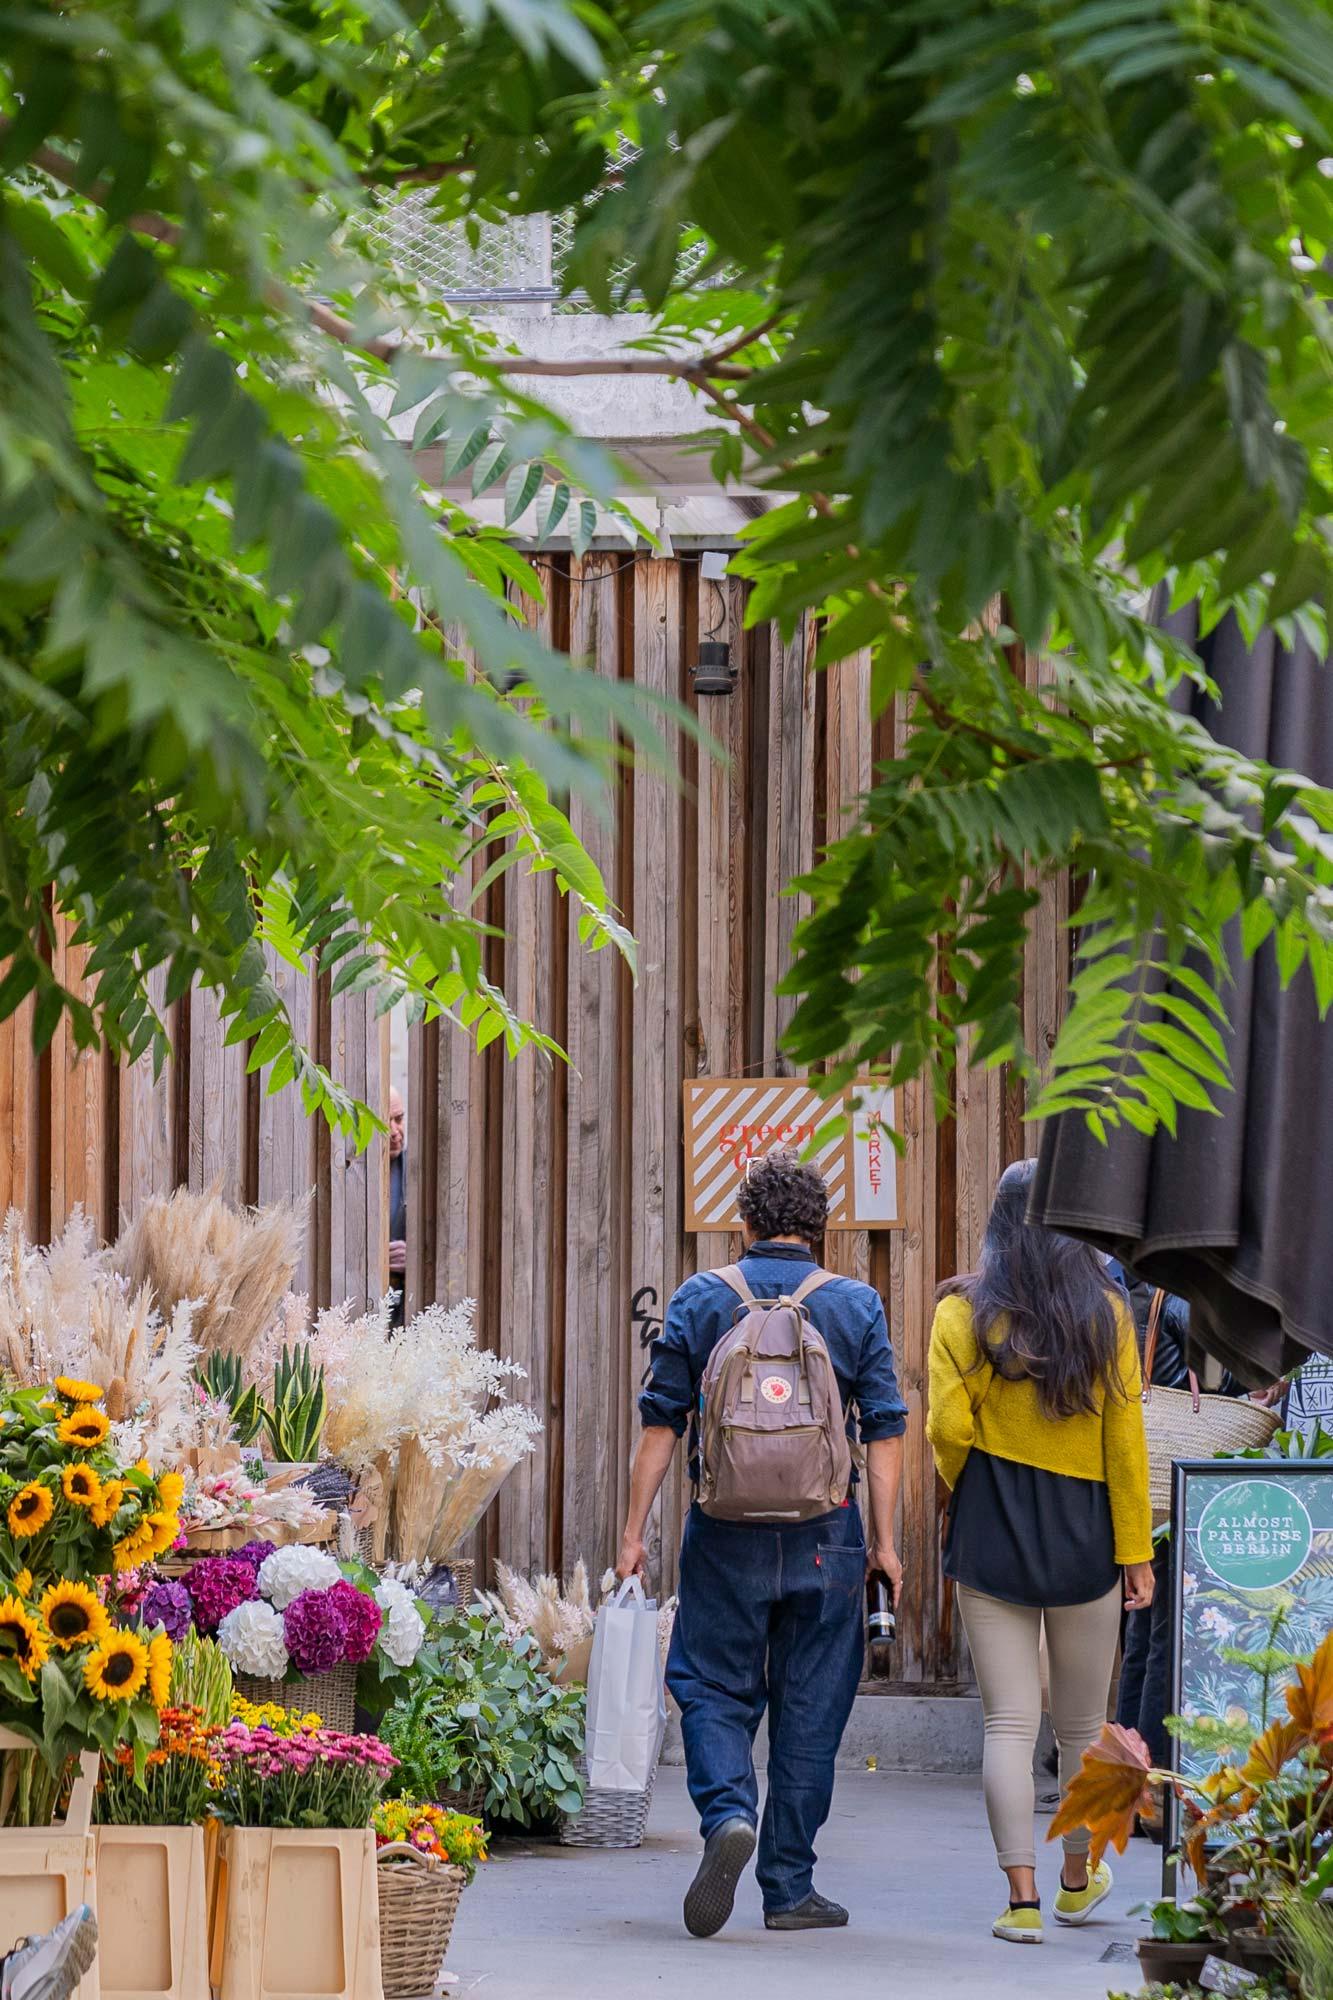 Green Days Sunday flower market